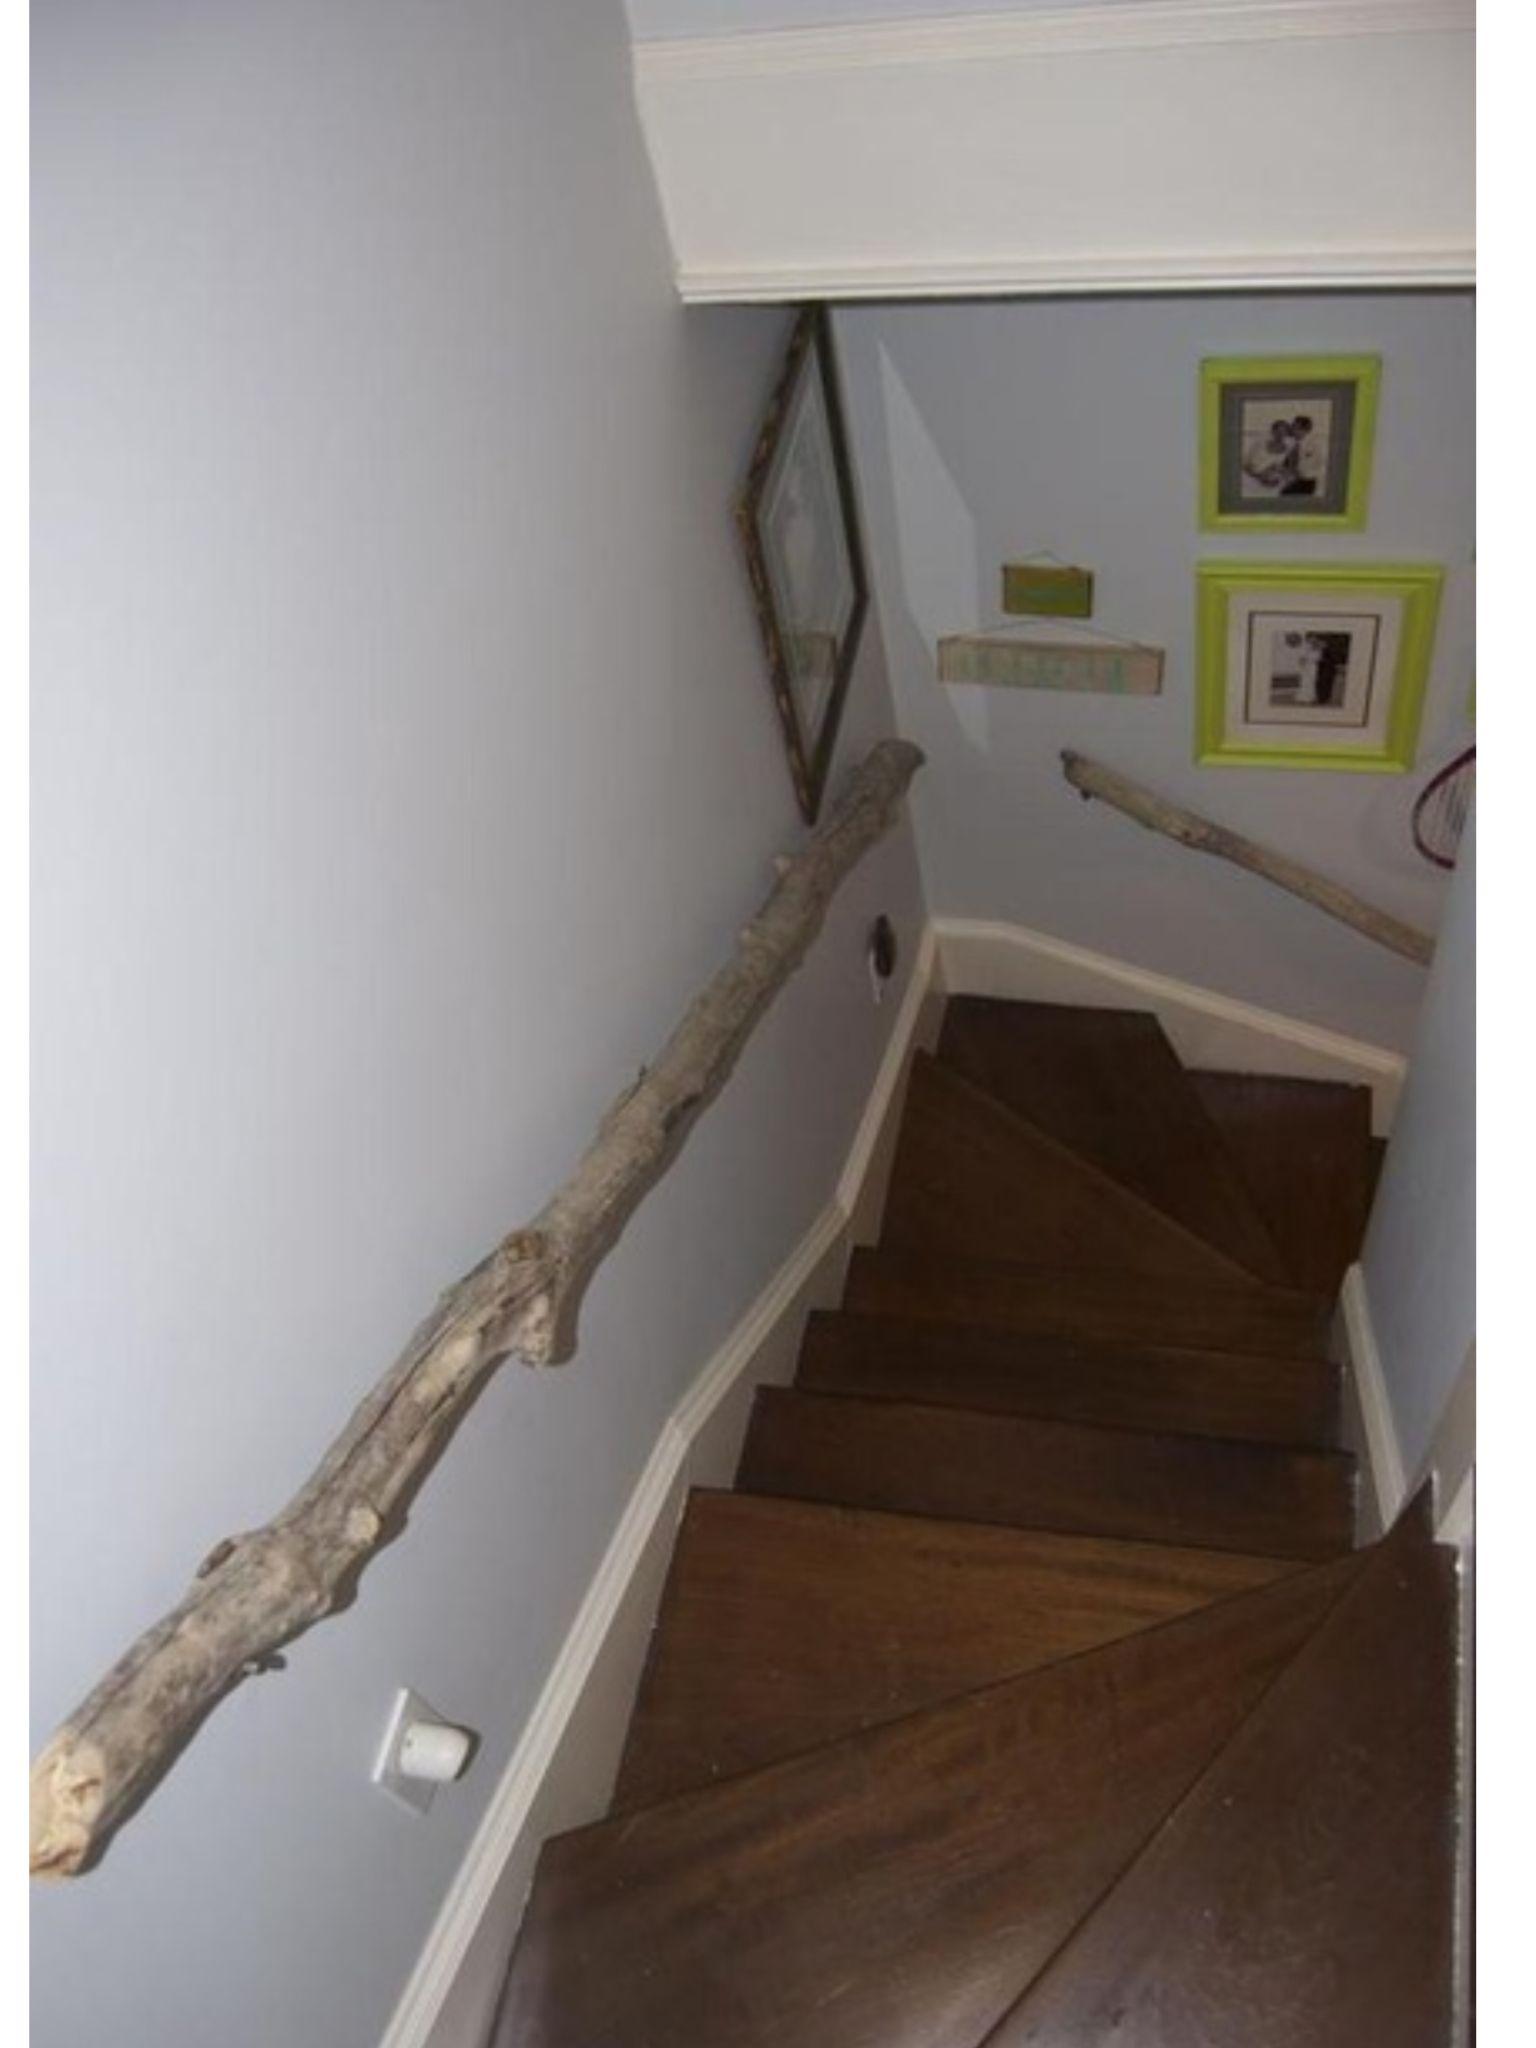 Best Driftwood Handrail Handrail Wood Handrail Driftwood 400 x 300